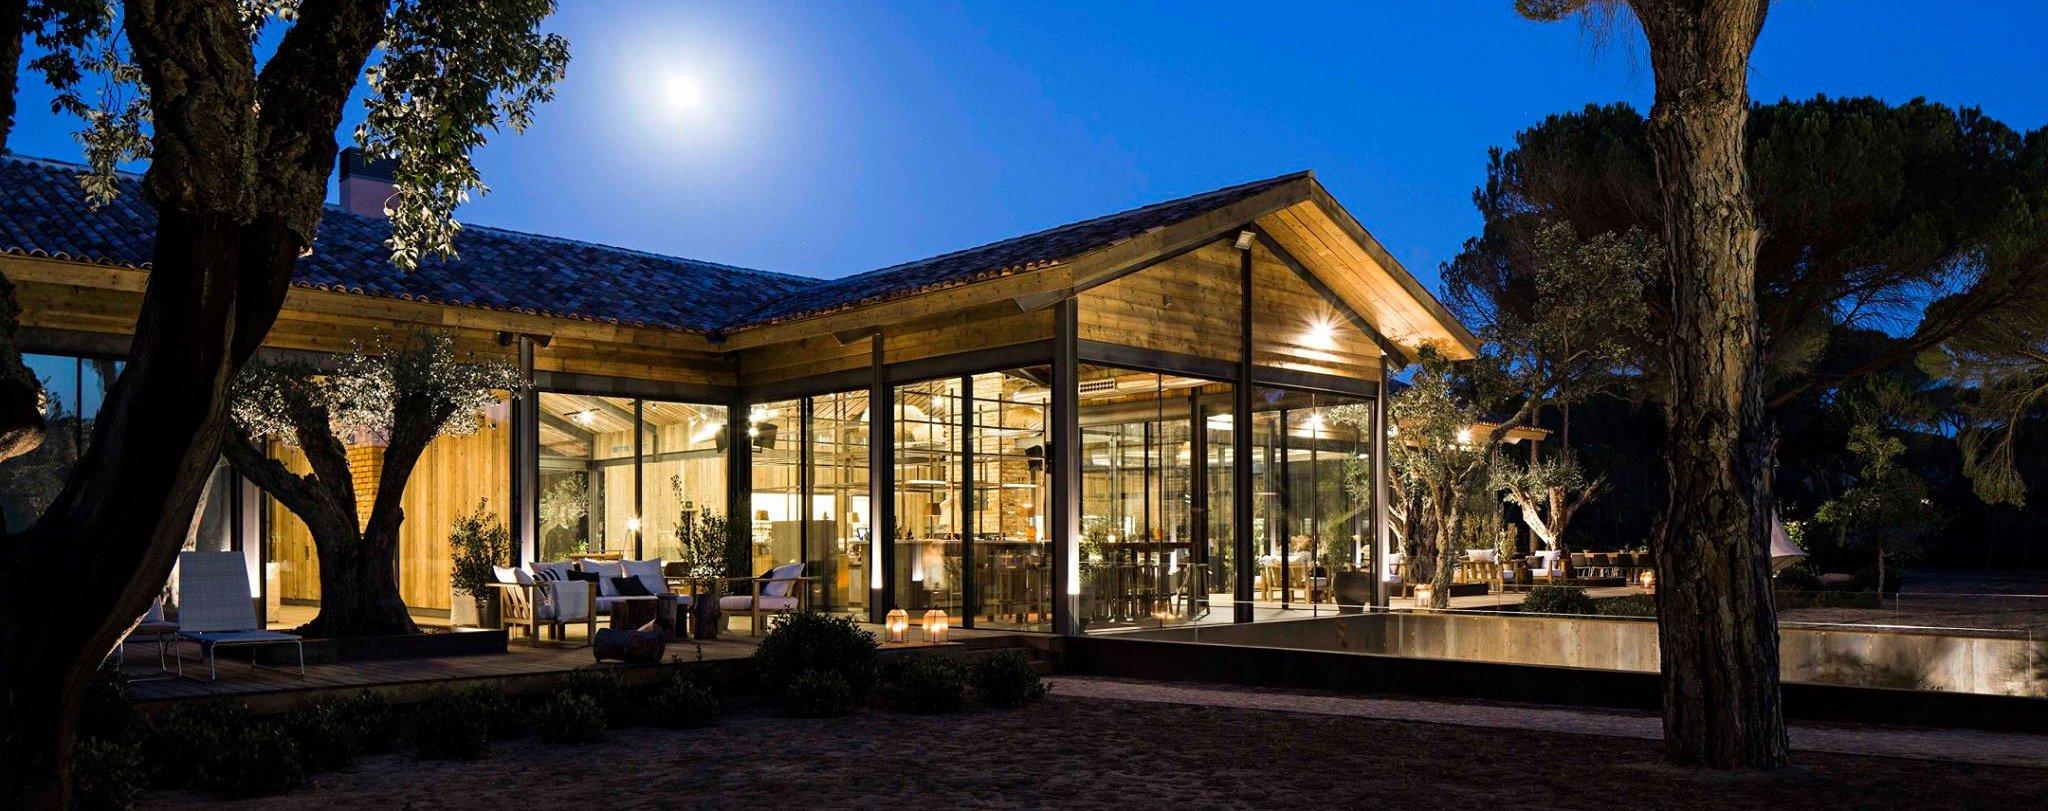 restaurant-sublime-comporta-night